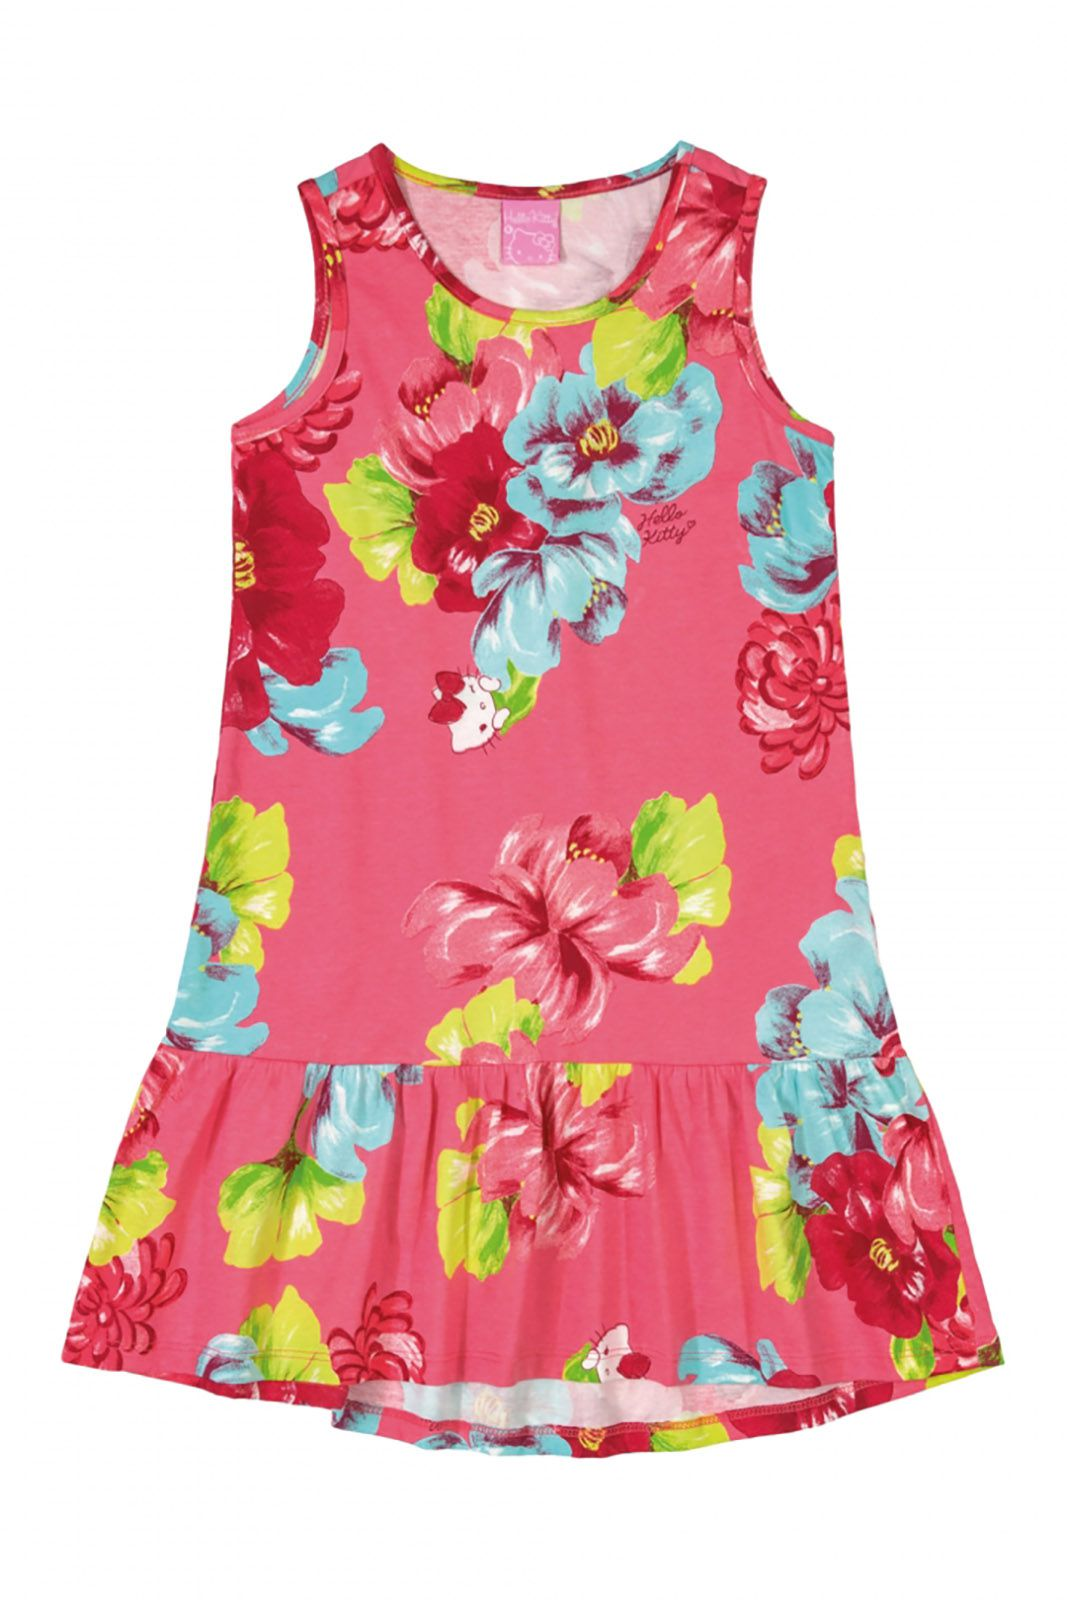 Vestido em meia malha  Hello Kitty Floral Goiaba